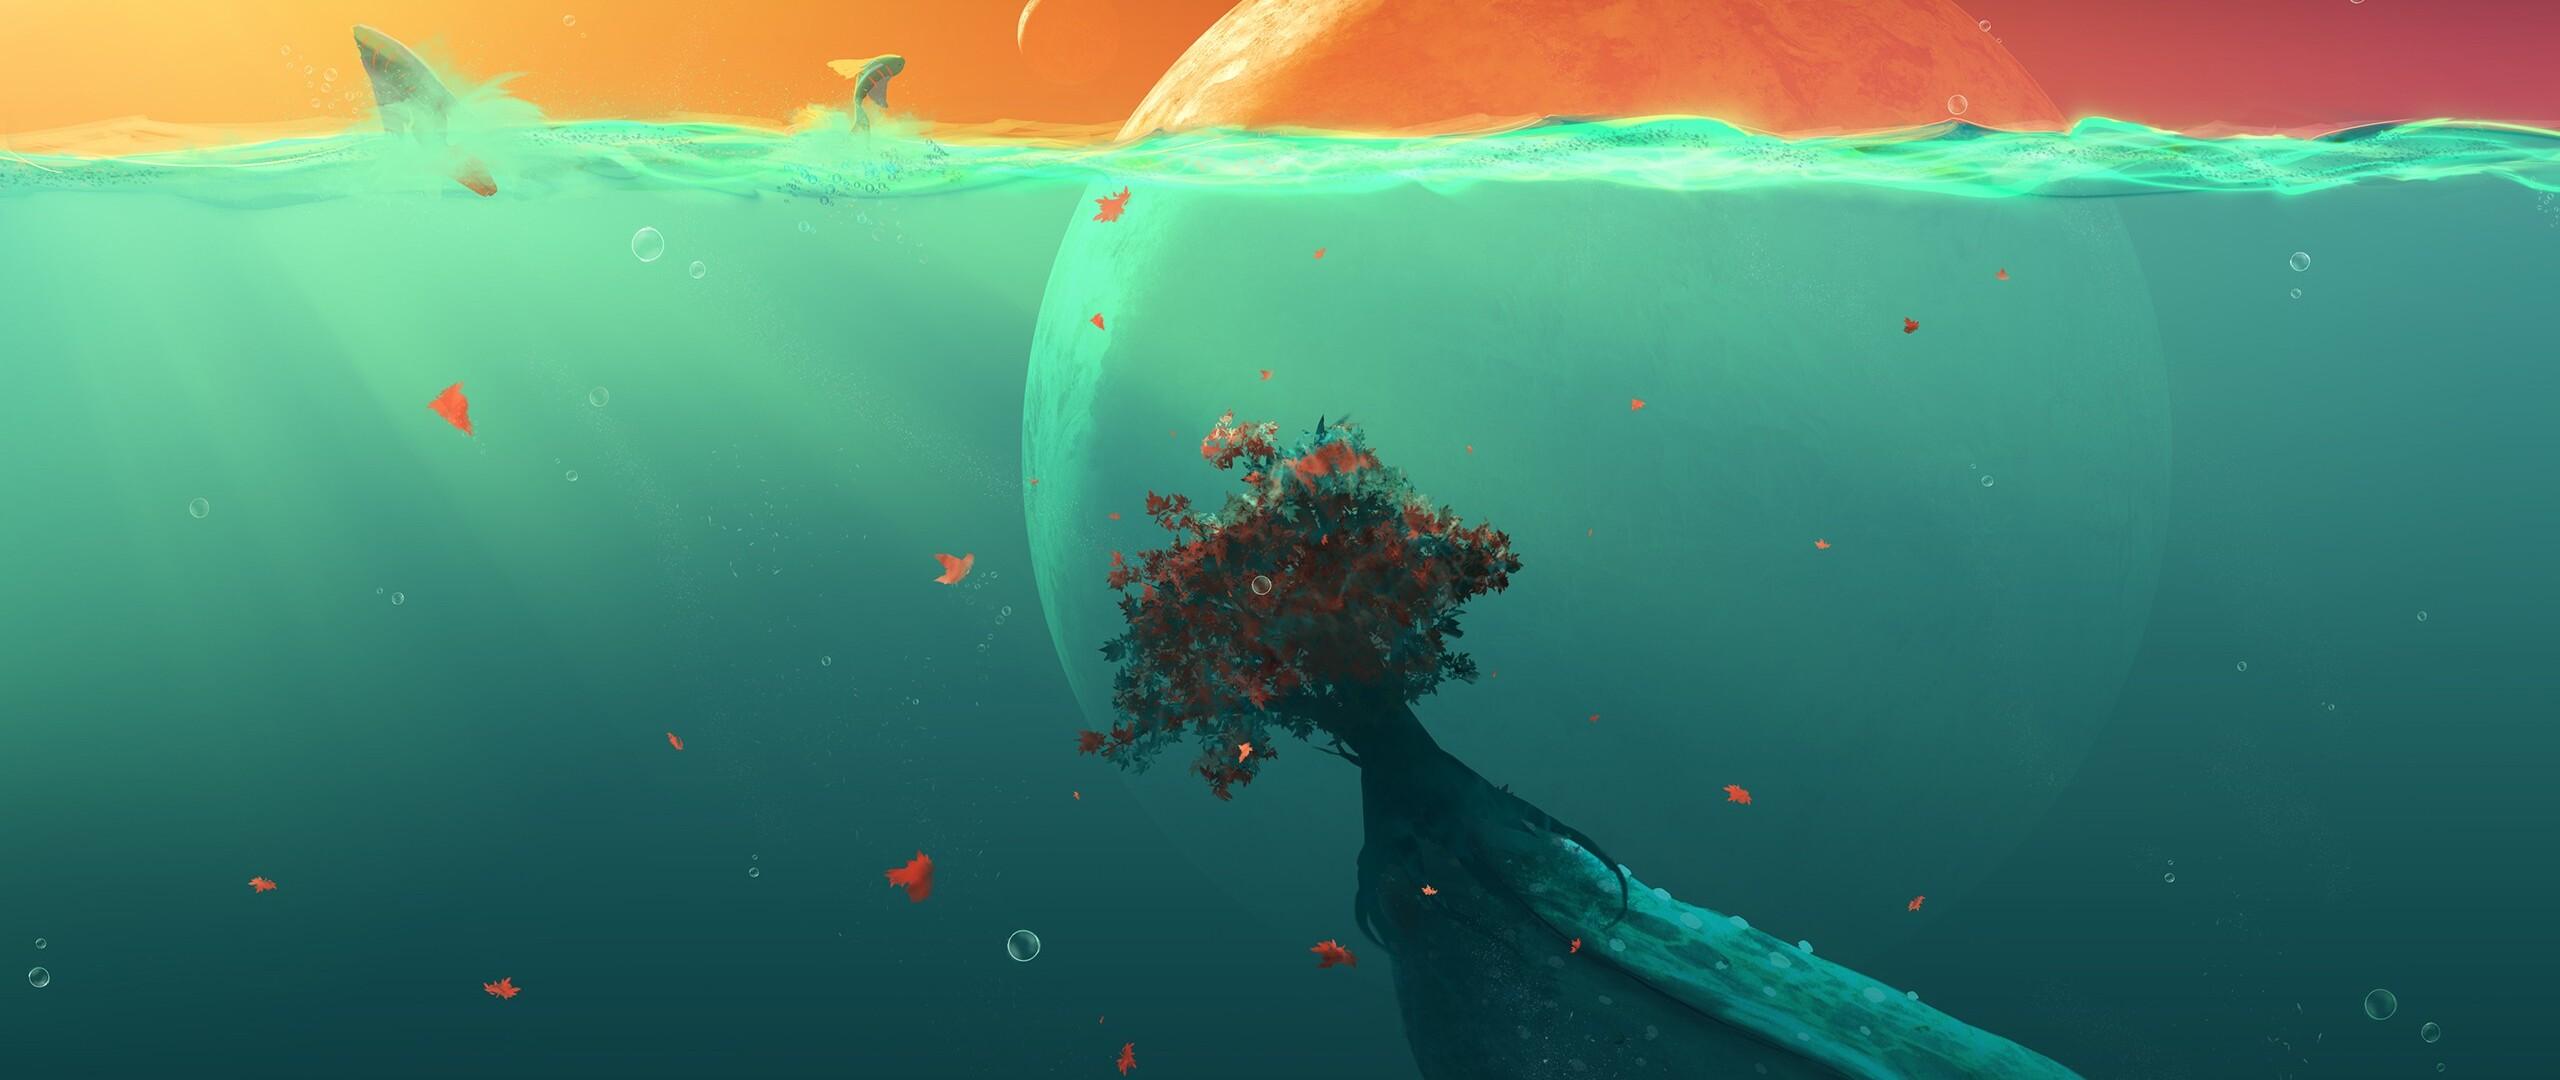 2560x1080 Deep Ocean Planet Fish 2560x1080 Resolution Hd 4k